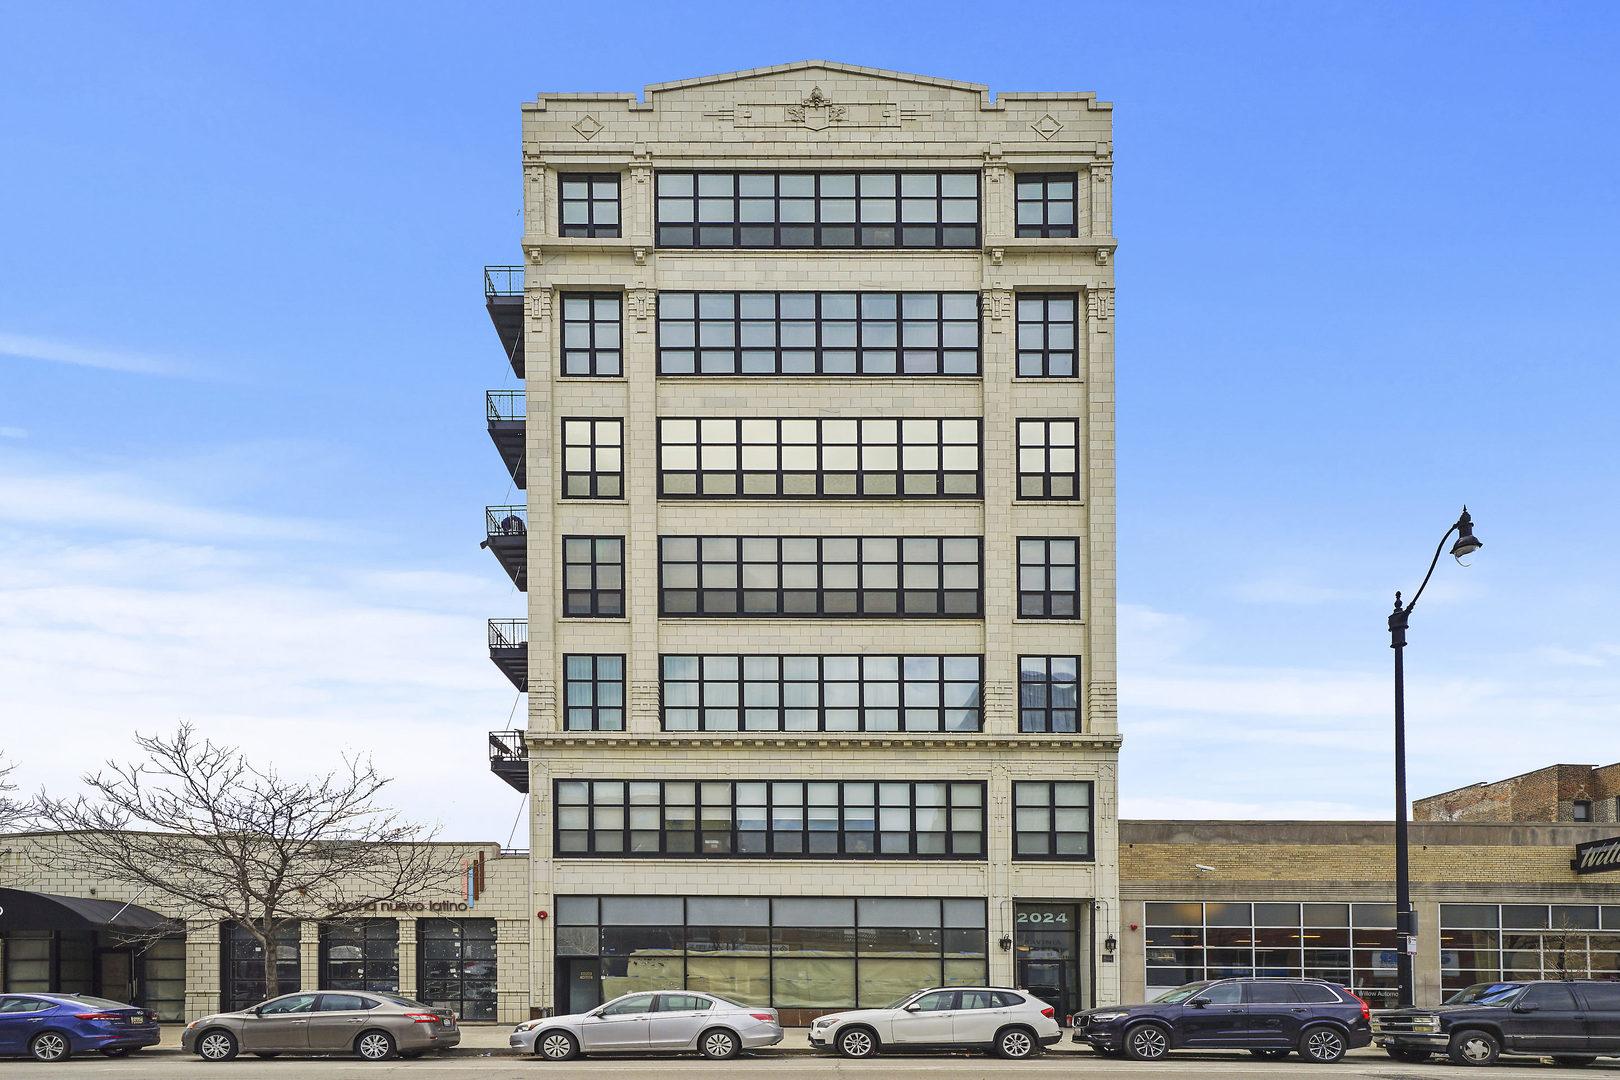 2024 S Wabash Exterior Photo